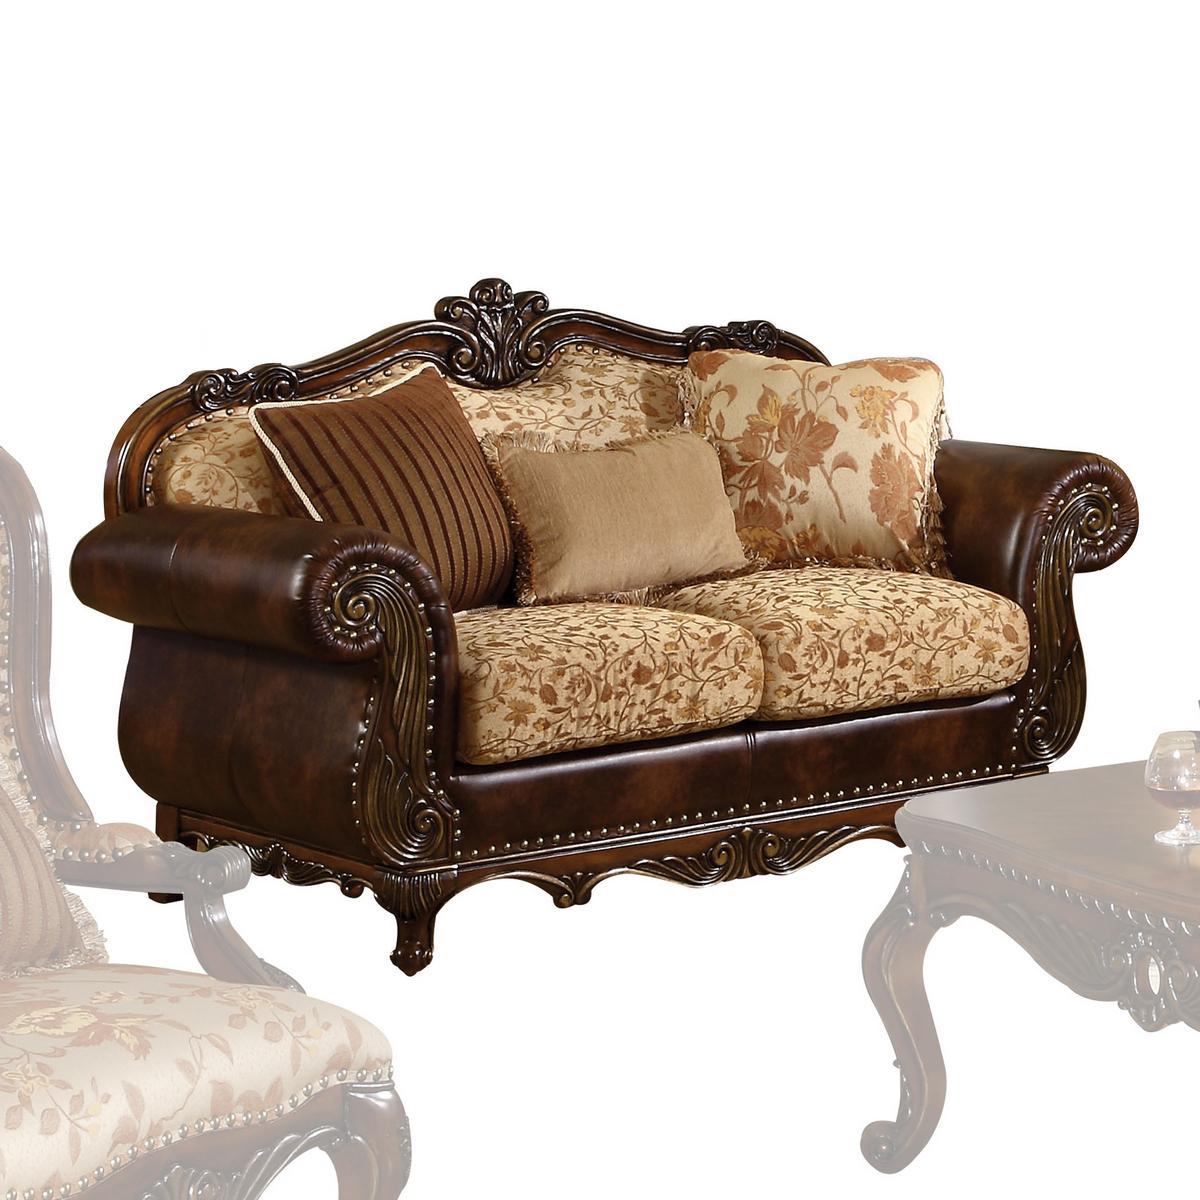 Acme Remington Loveseat Pillows Bonded Leather Fabric Cherry